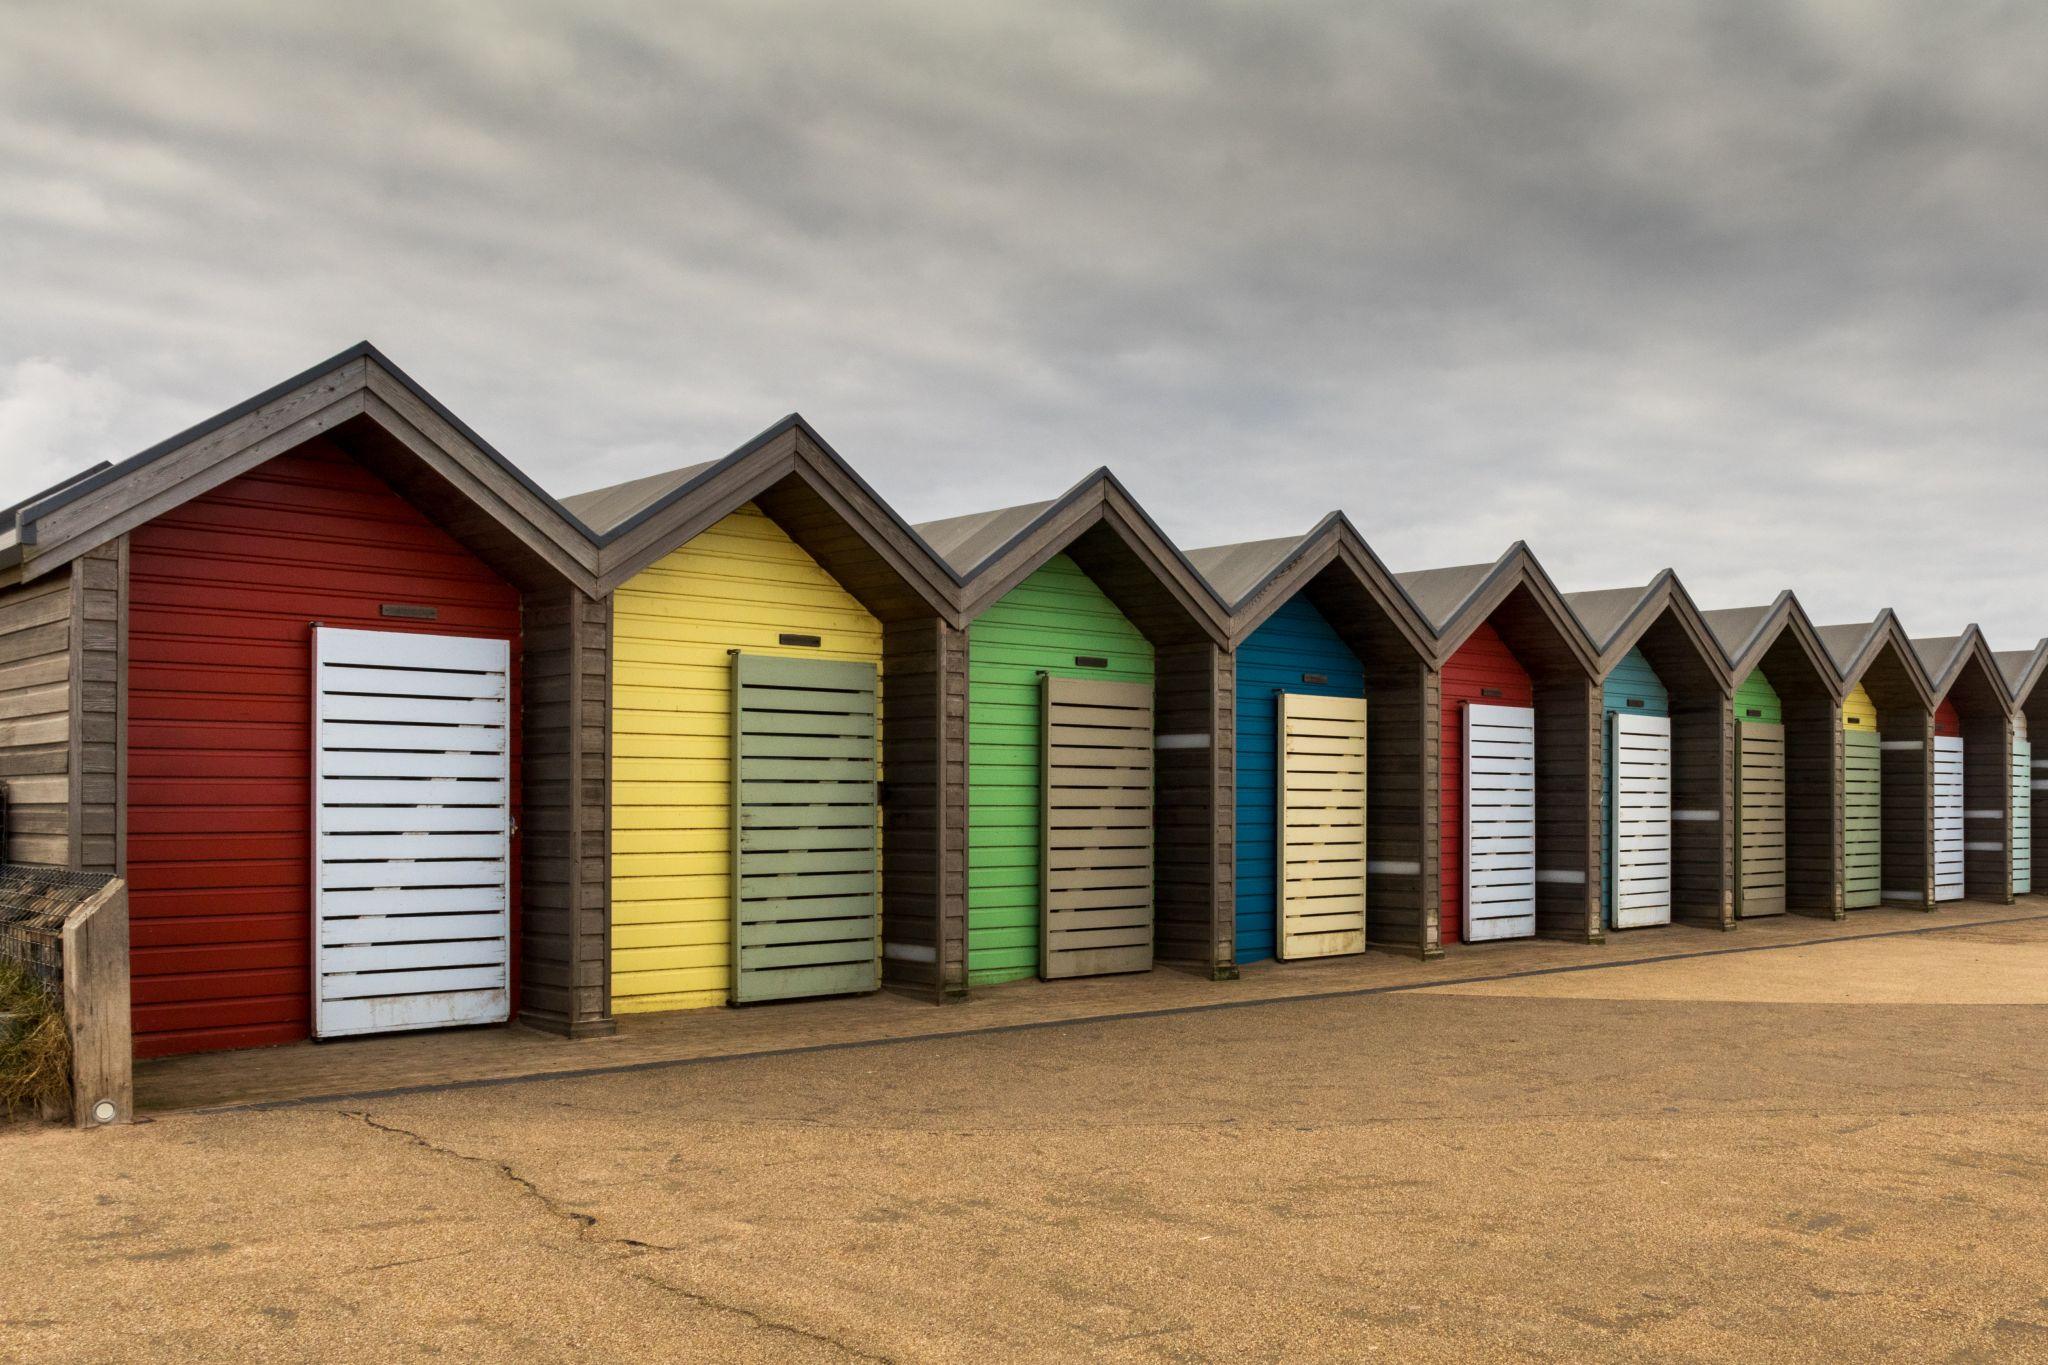 Blyth Beach huts, United Kingdom